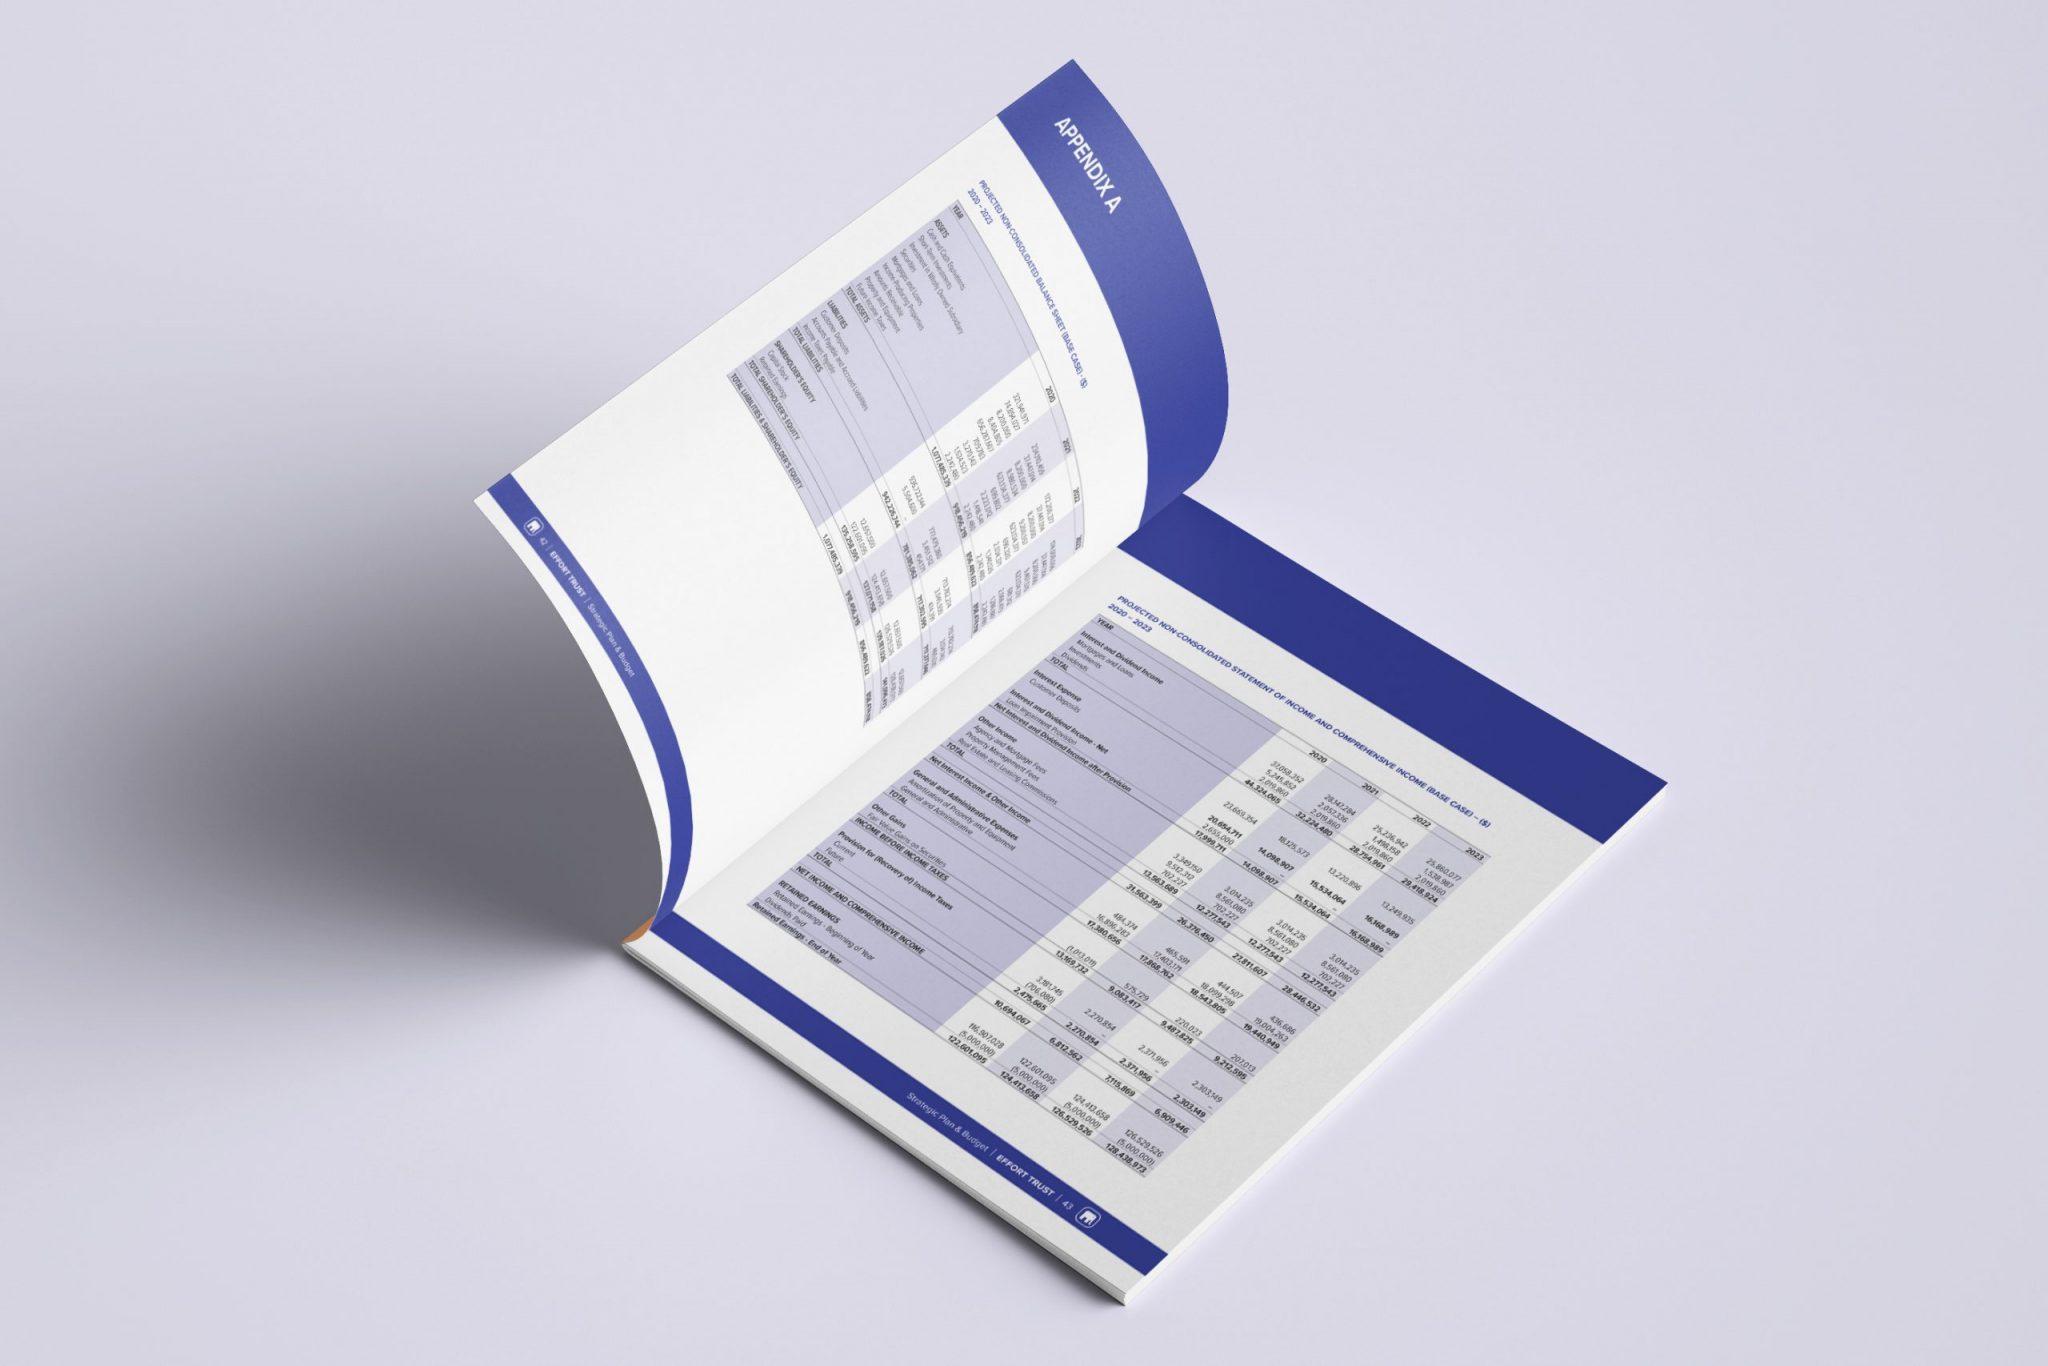 effort-trust-annual-report-spread-3-1